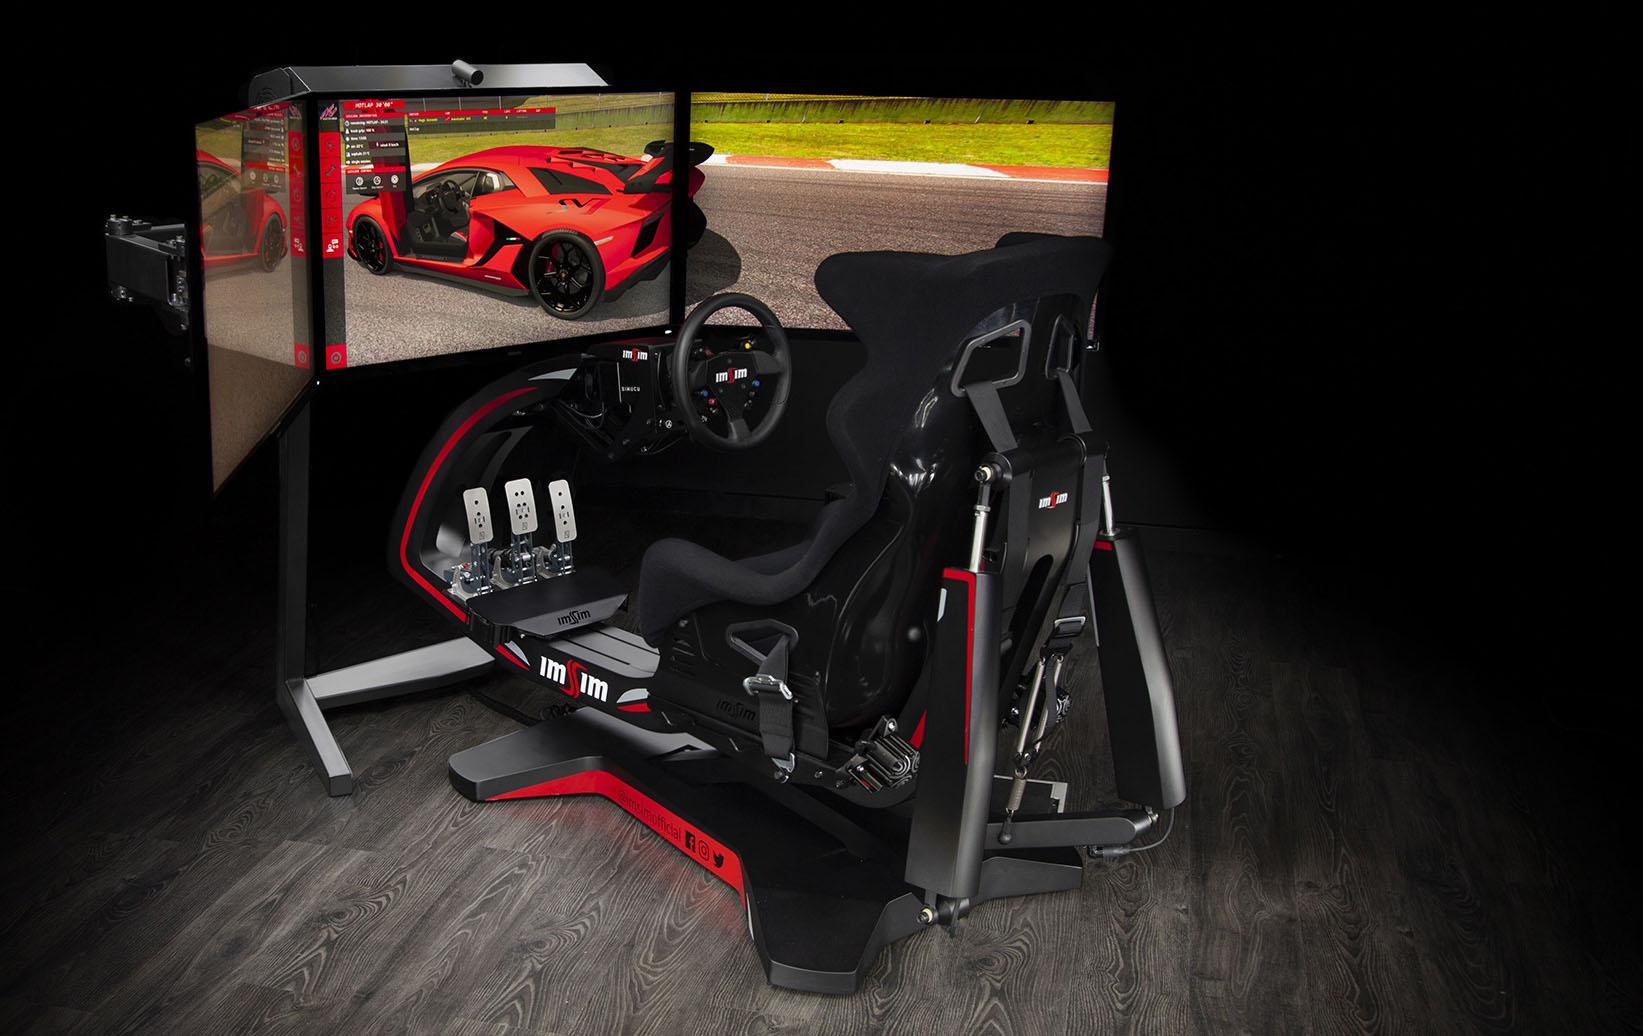 shop.gperformance.eu - IMSIM professional 3DOF motion simulator - iso with screens 2